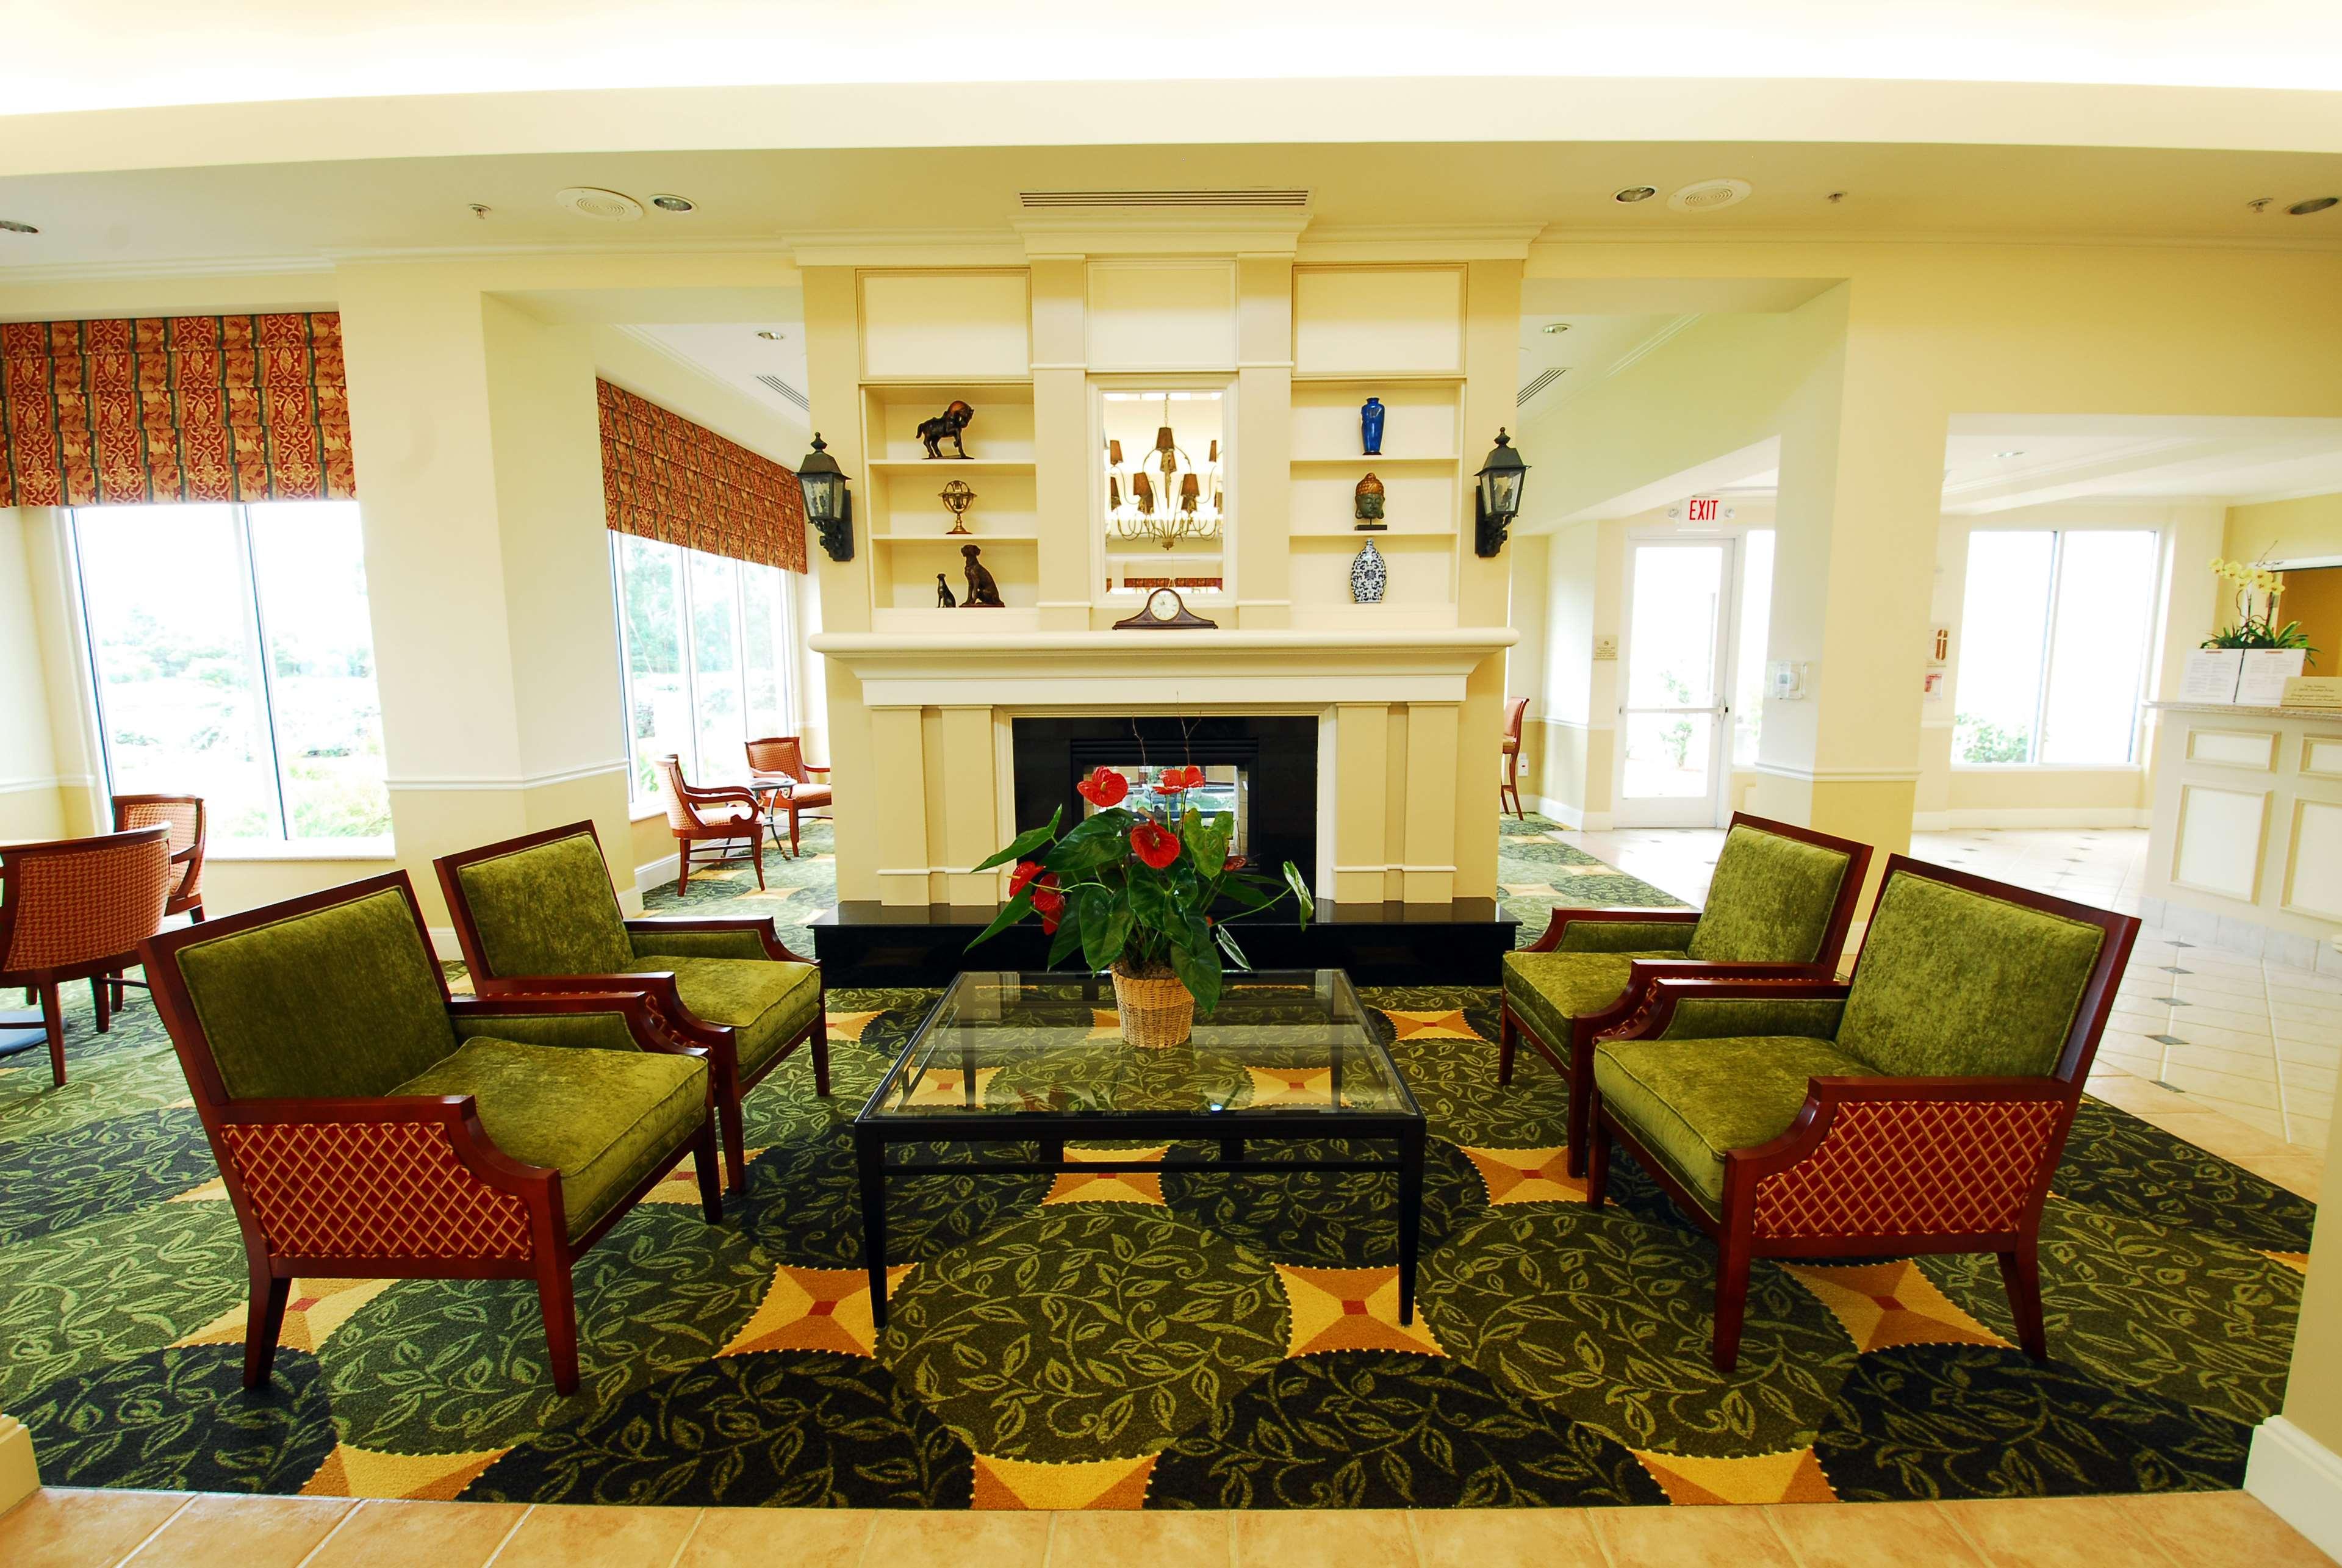 Hilton Garden Inn San Francisco Airport/Burlingame image 3